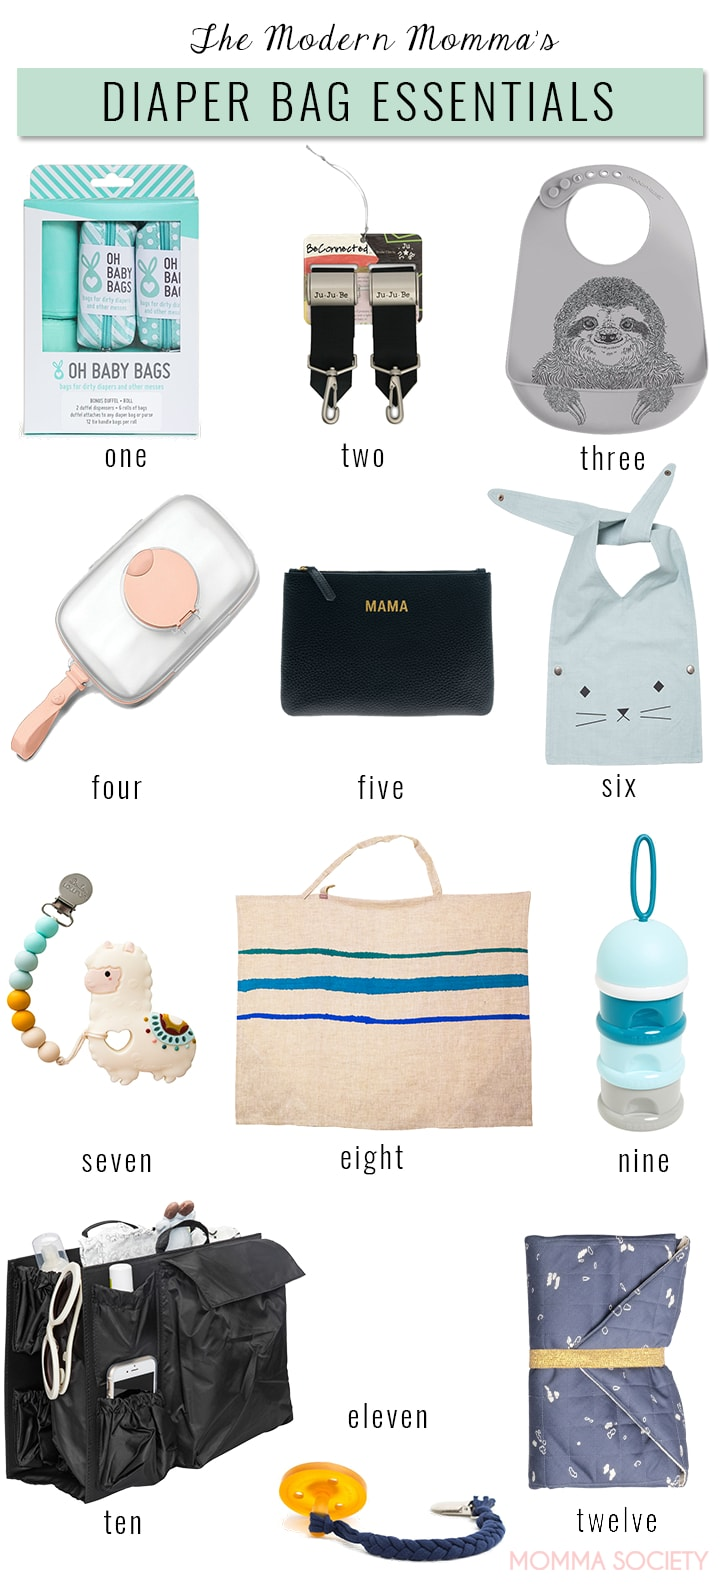 Diaper Bag Essentals.jpg